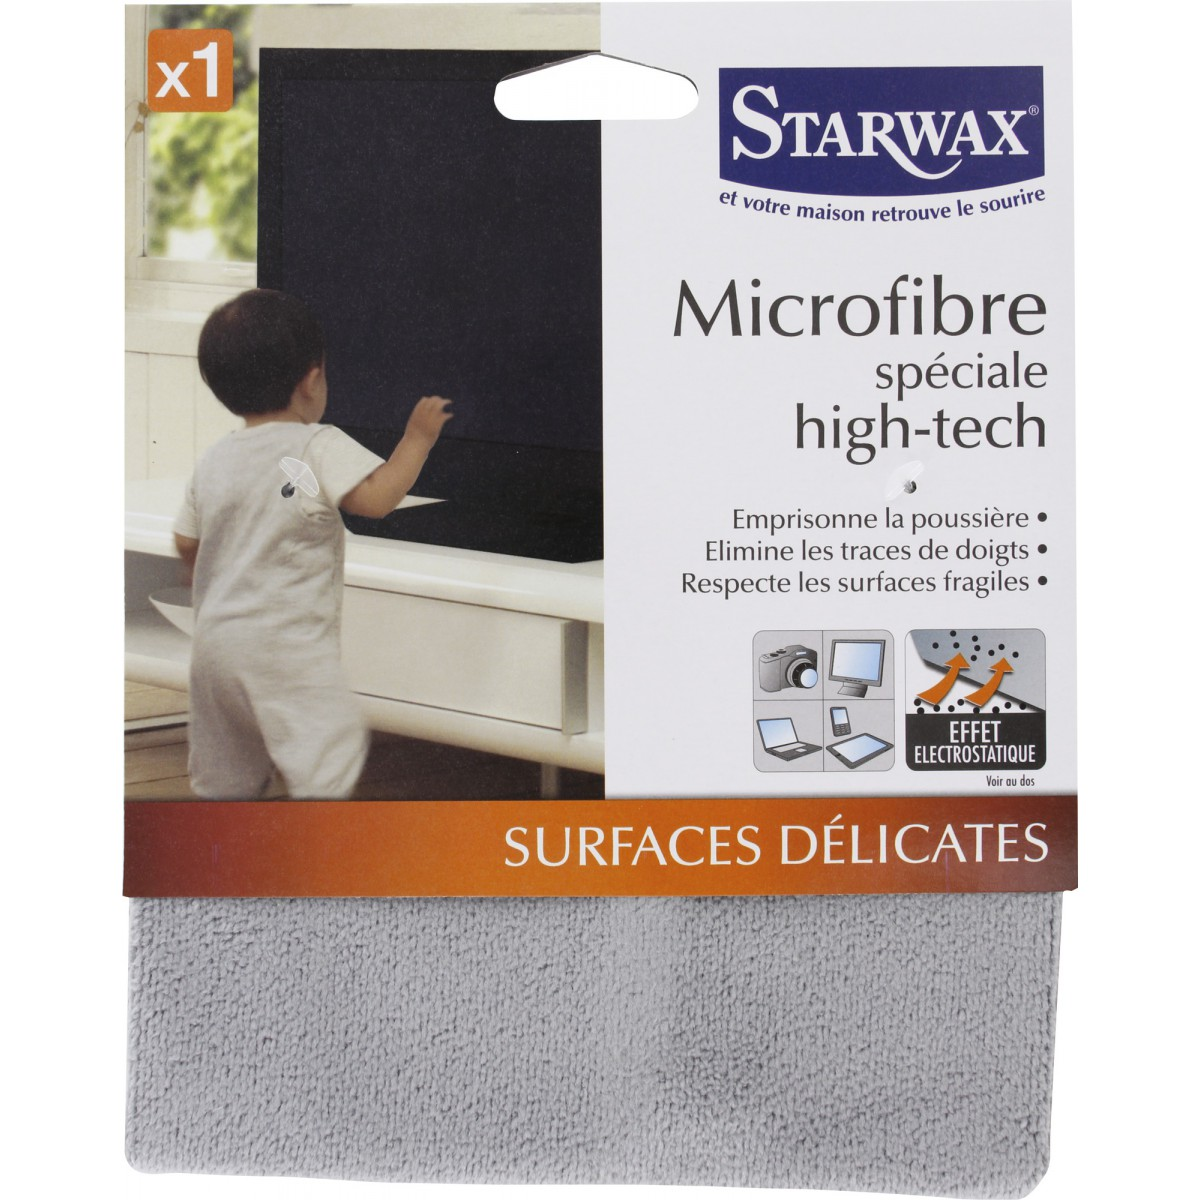 Microfibre spécial high-tech Starwax